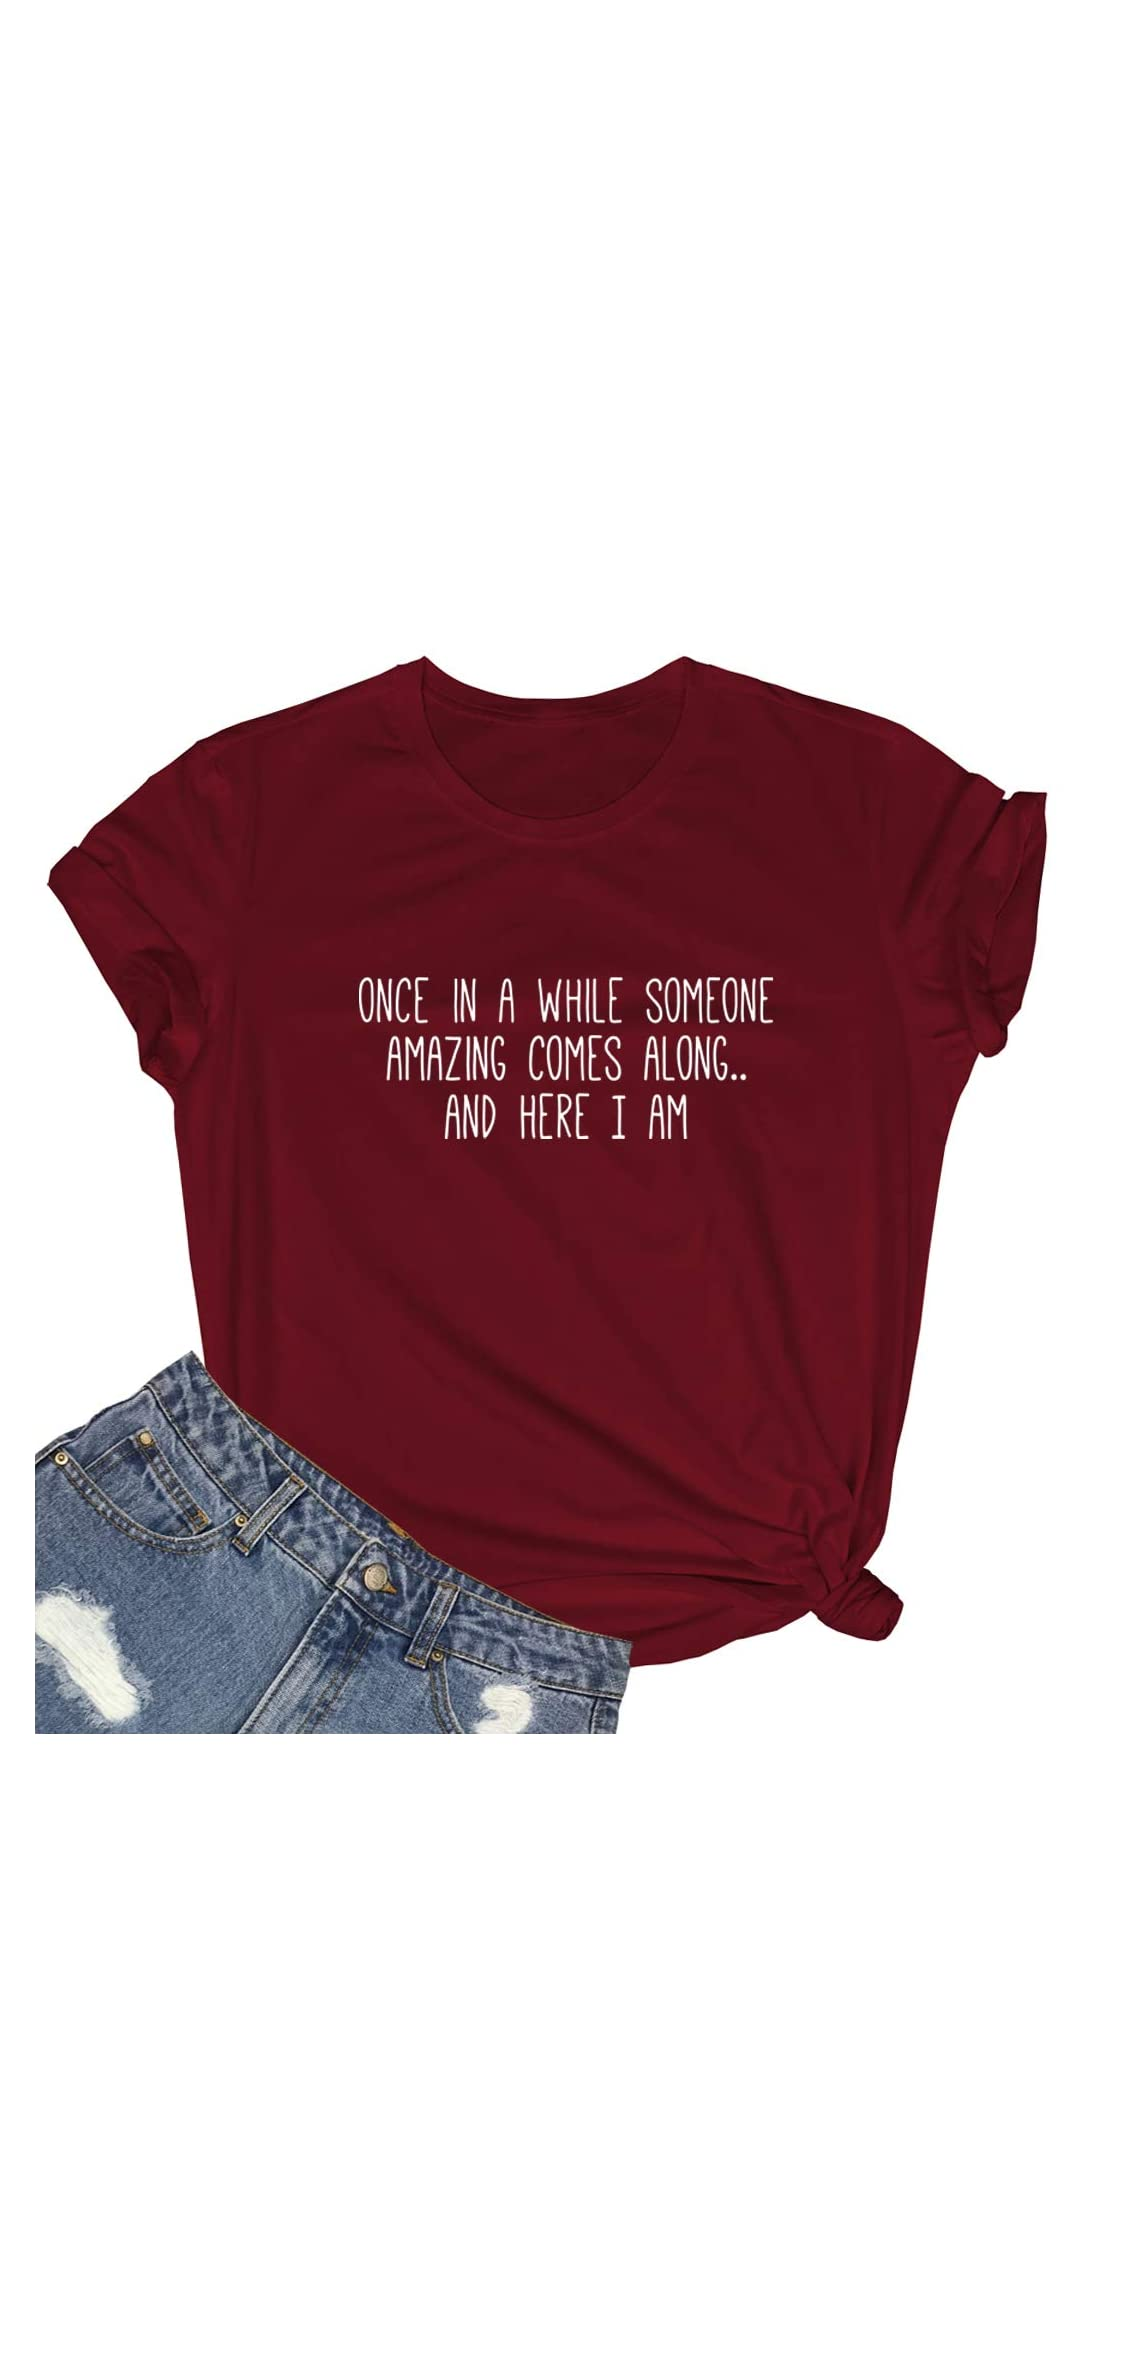 Women Cute Tees Graphic Funny Girl Tshirts